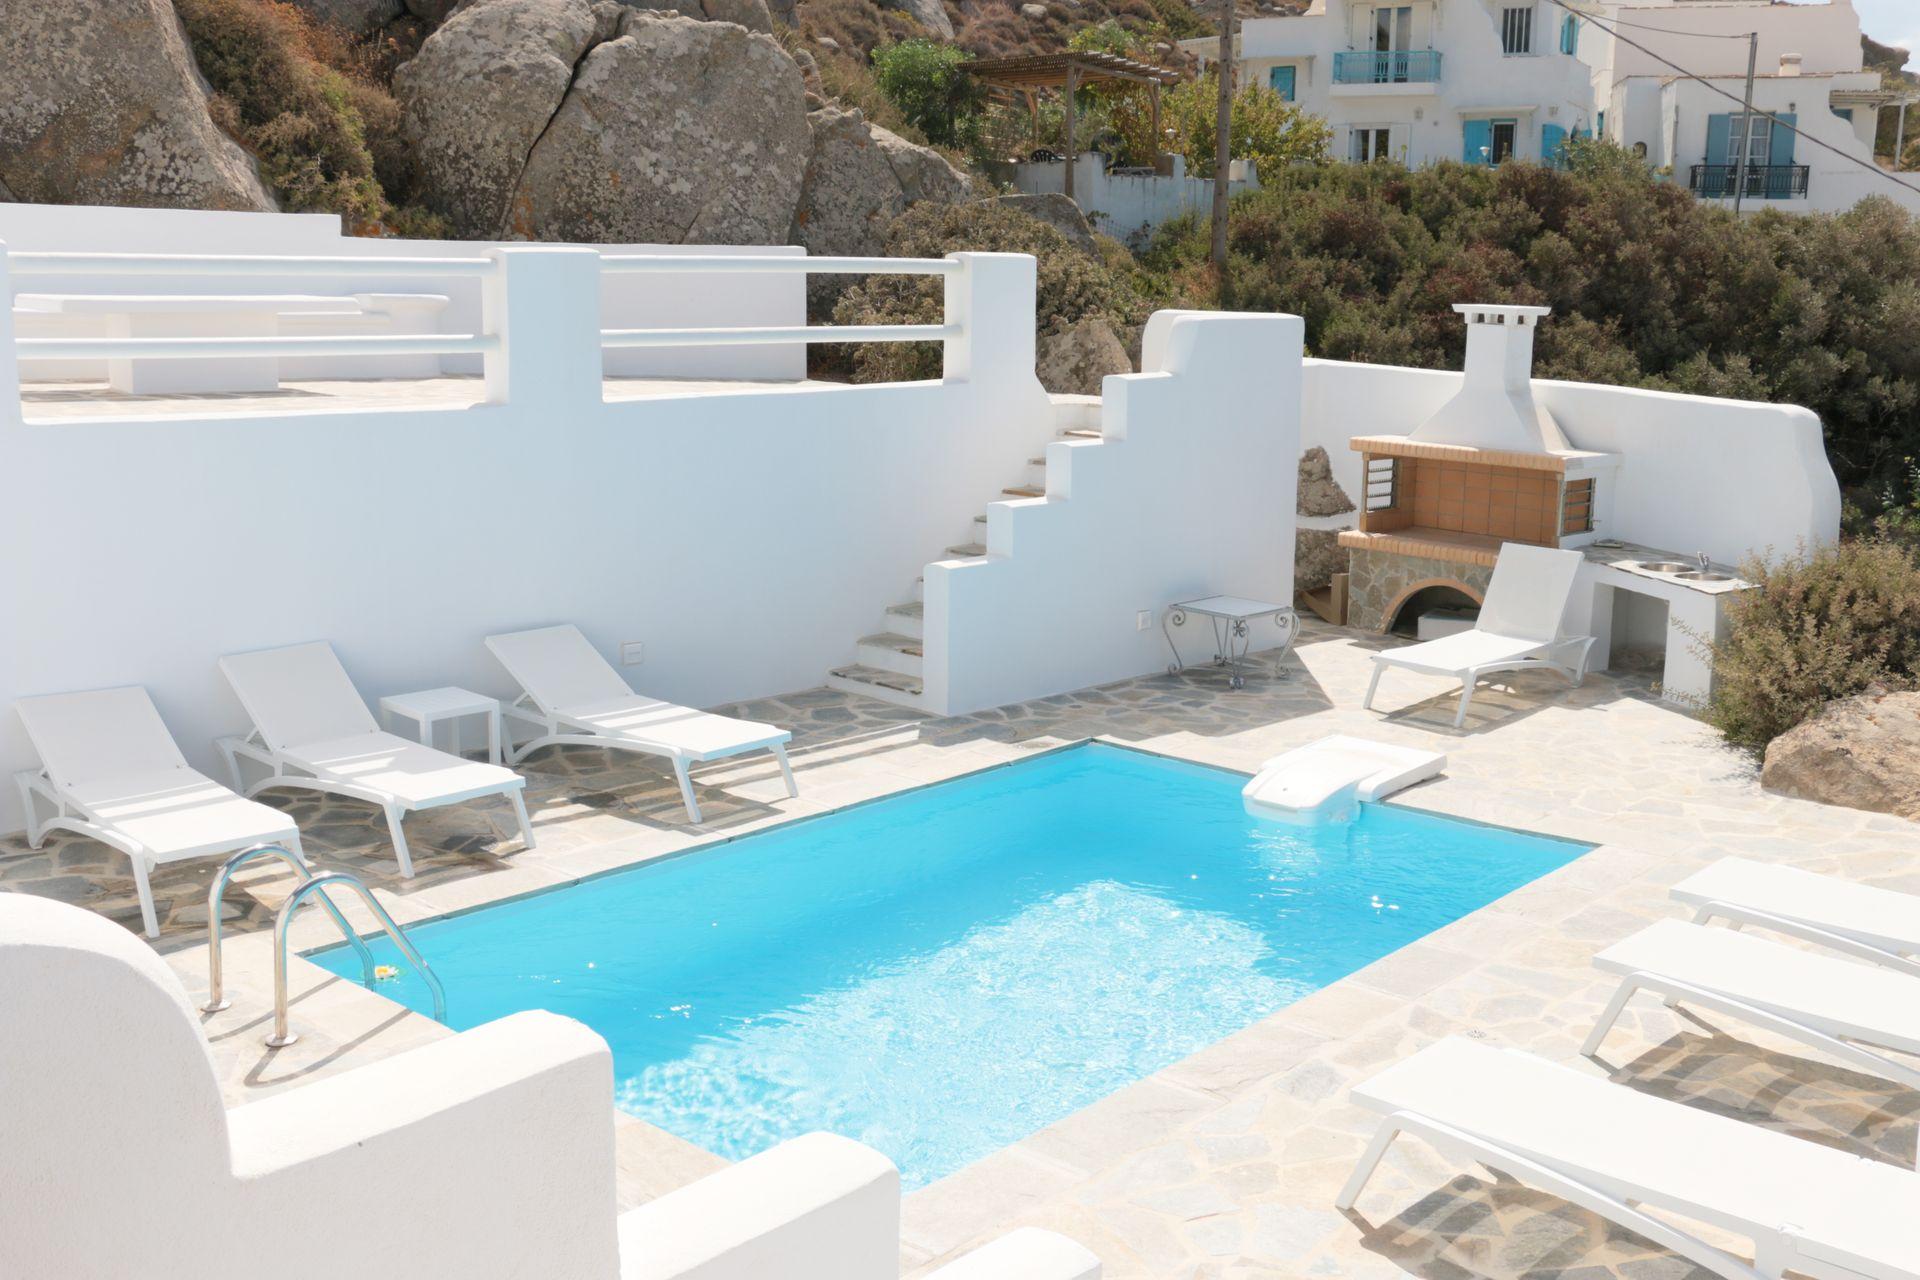 Apricot & Sea Luxury Villas - Νάξος ✦ 4 Ημέρες